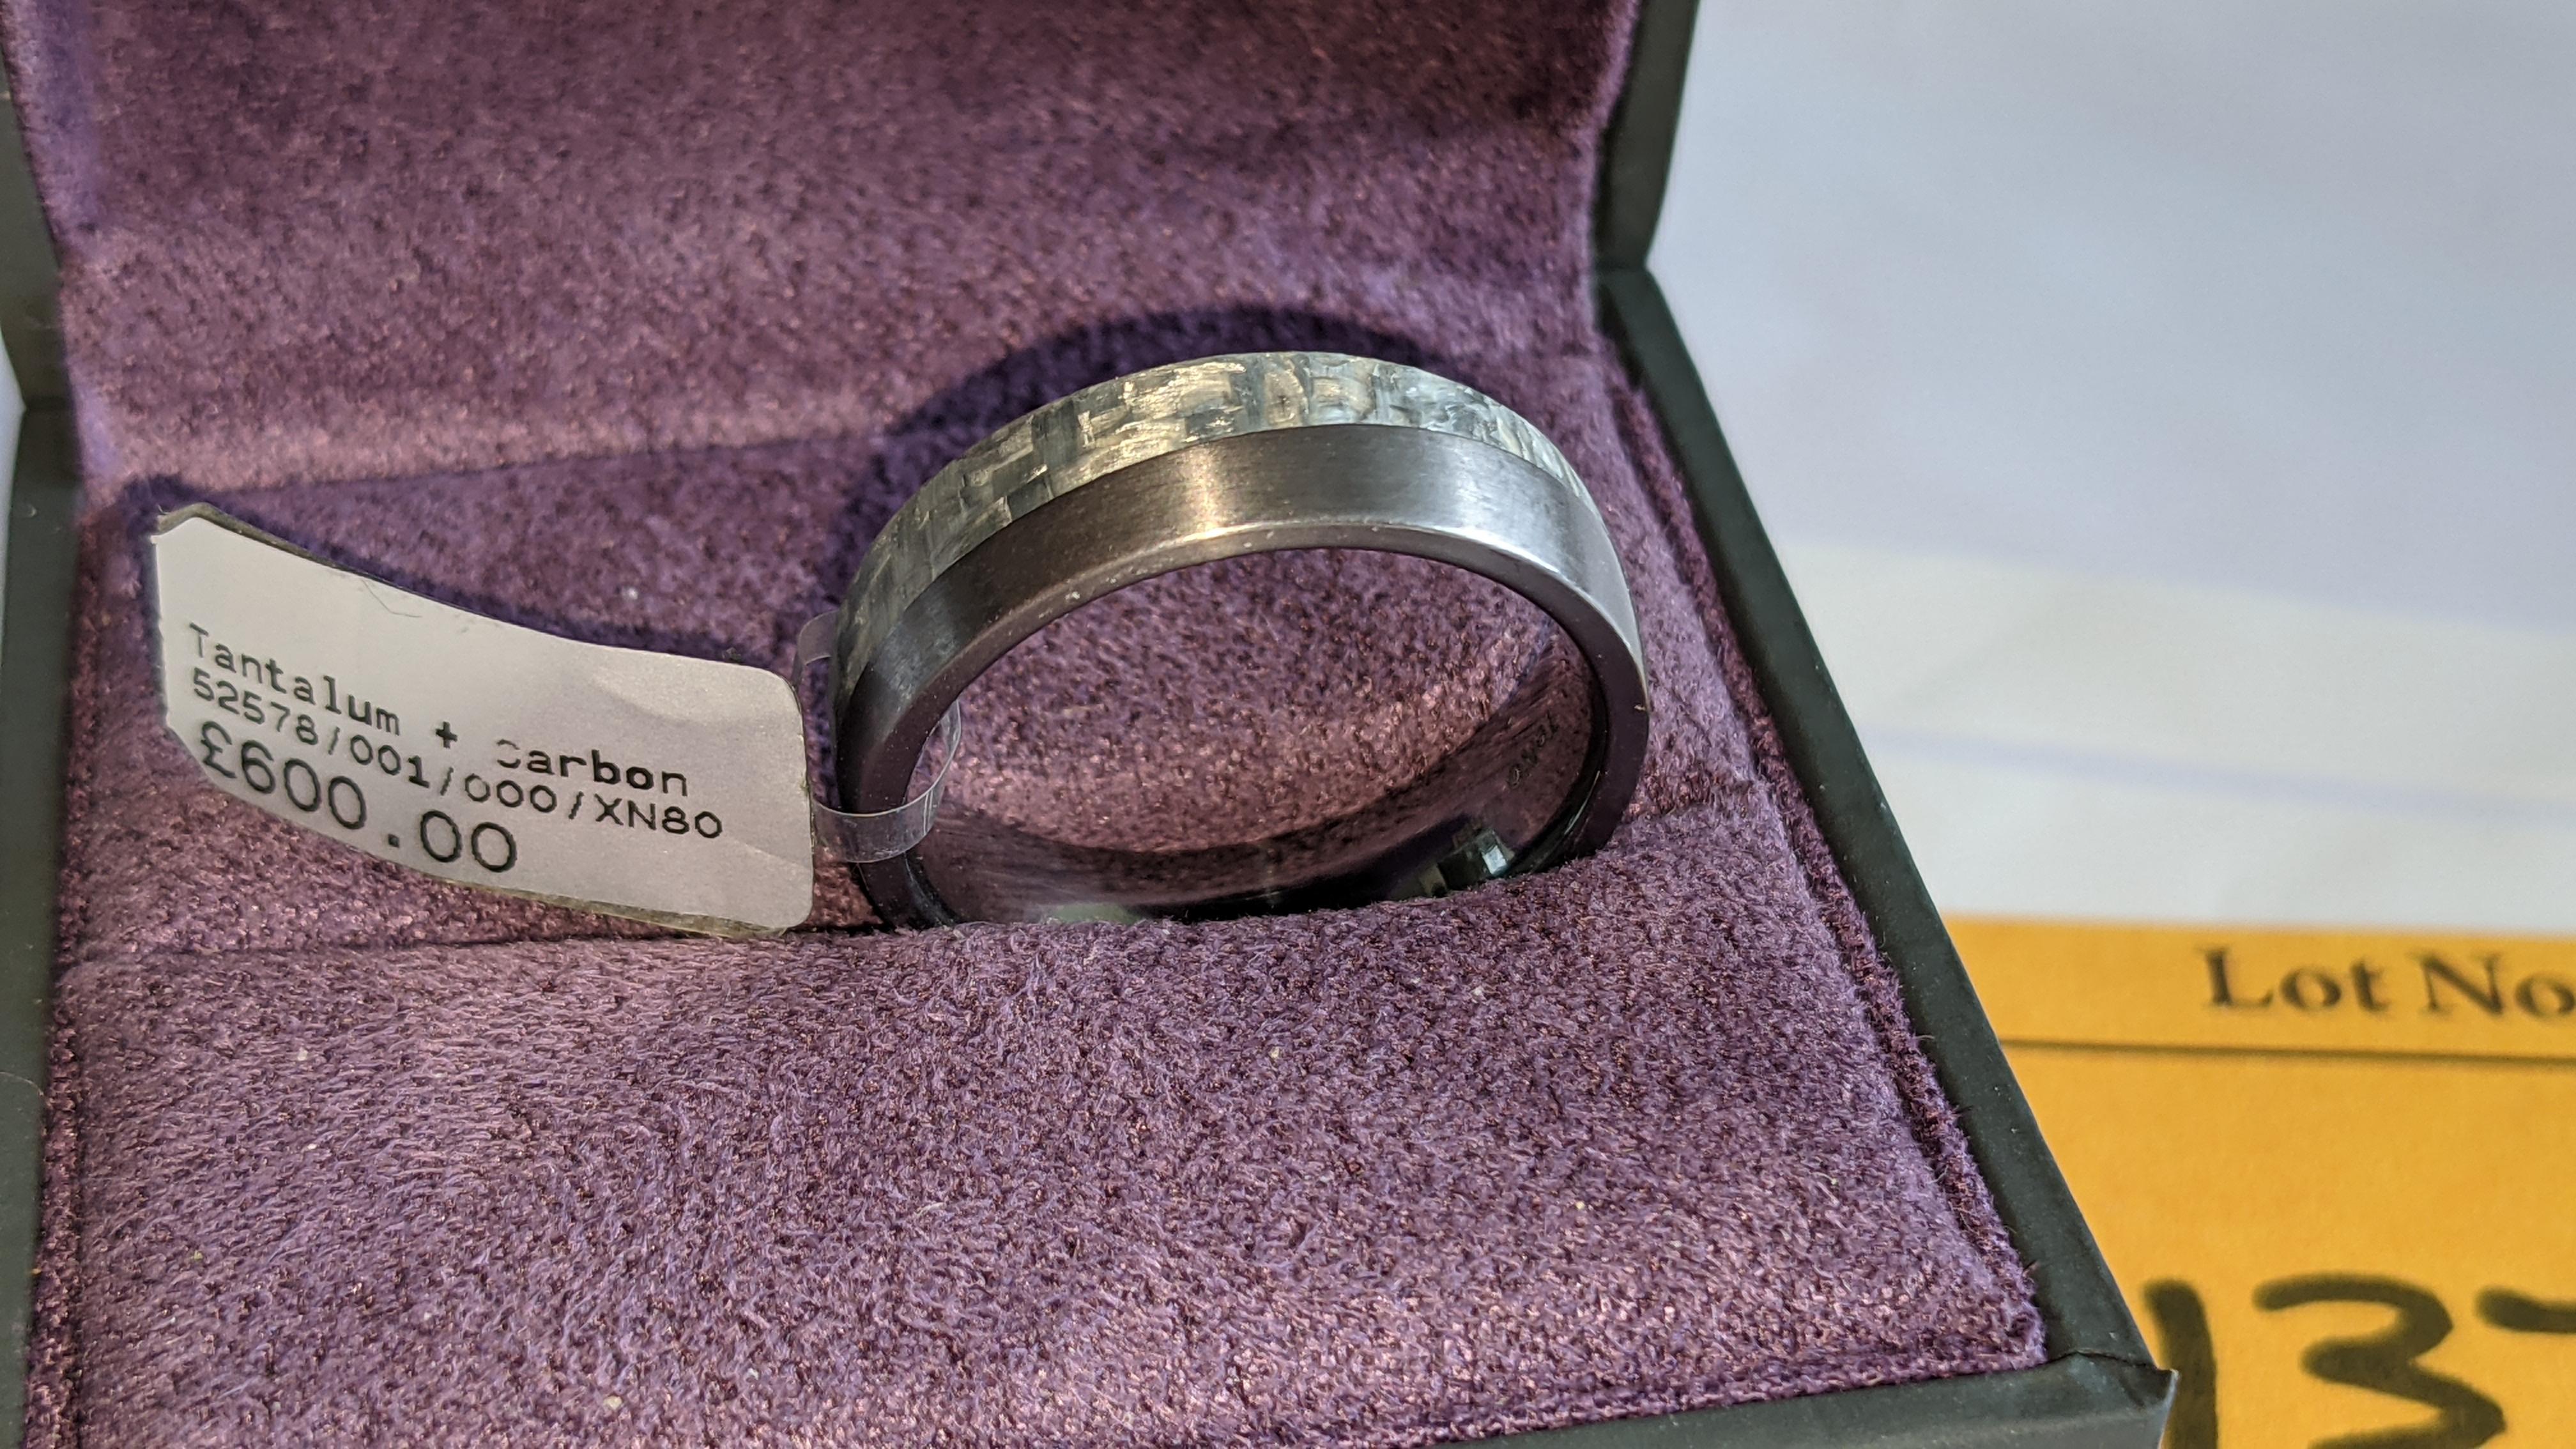 Tantalum & carbon ring RRP £600 - Image 2 of 13